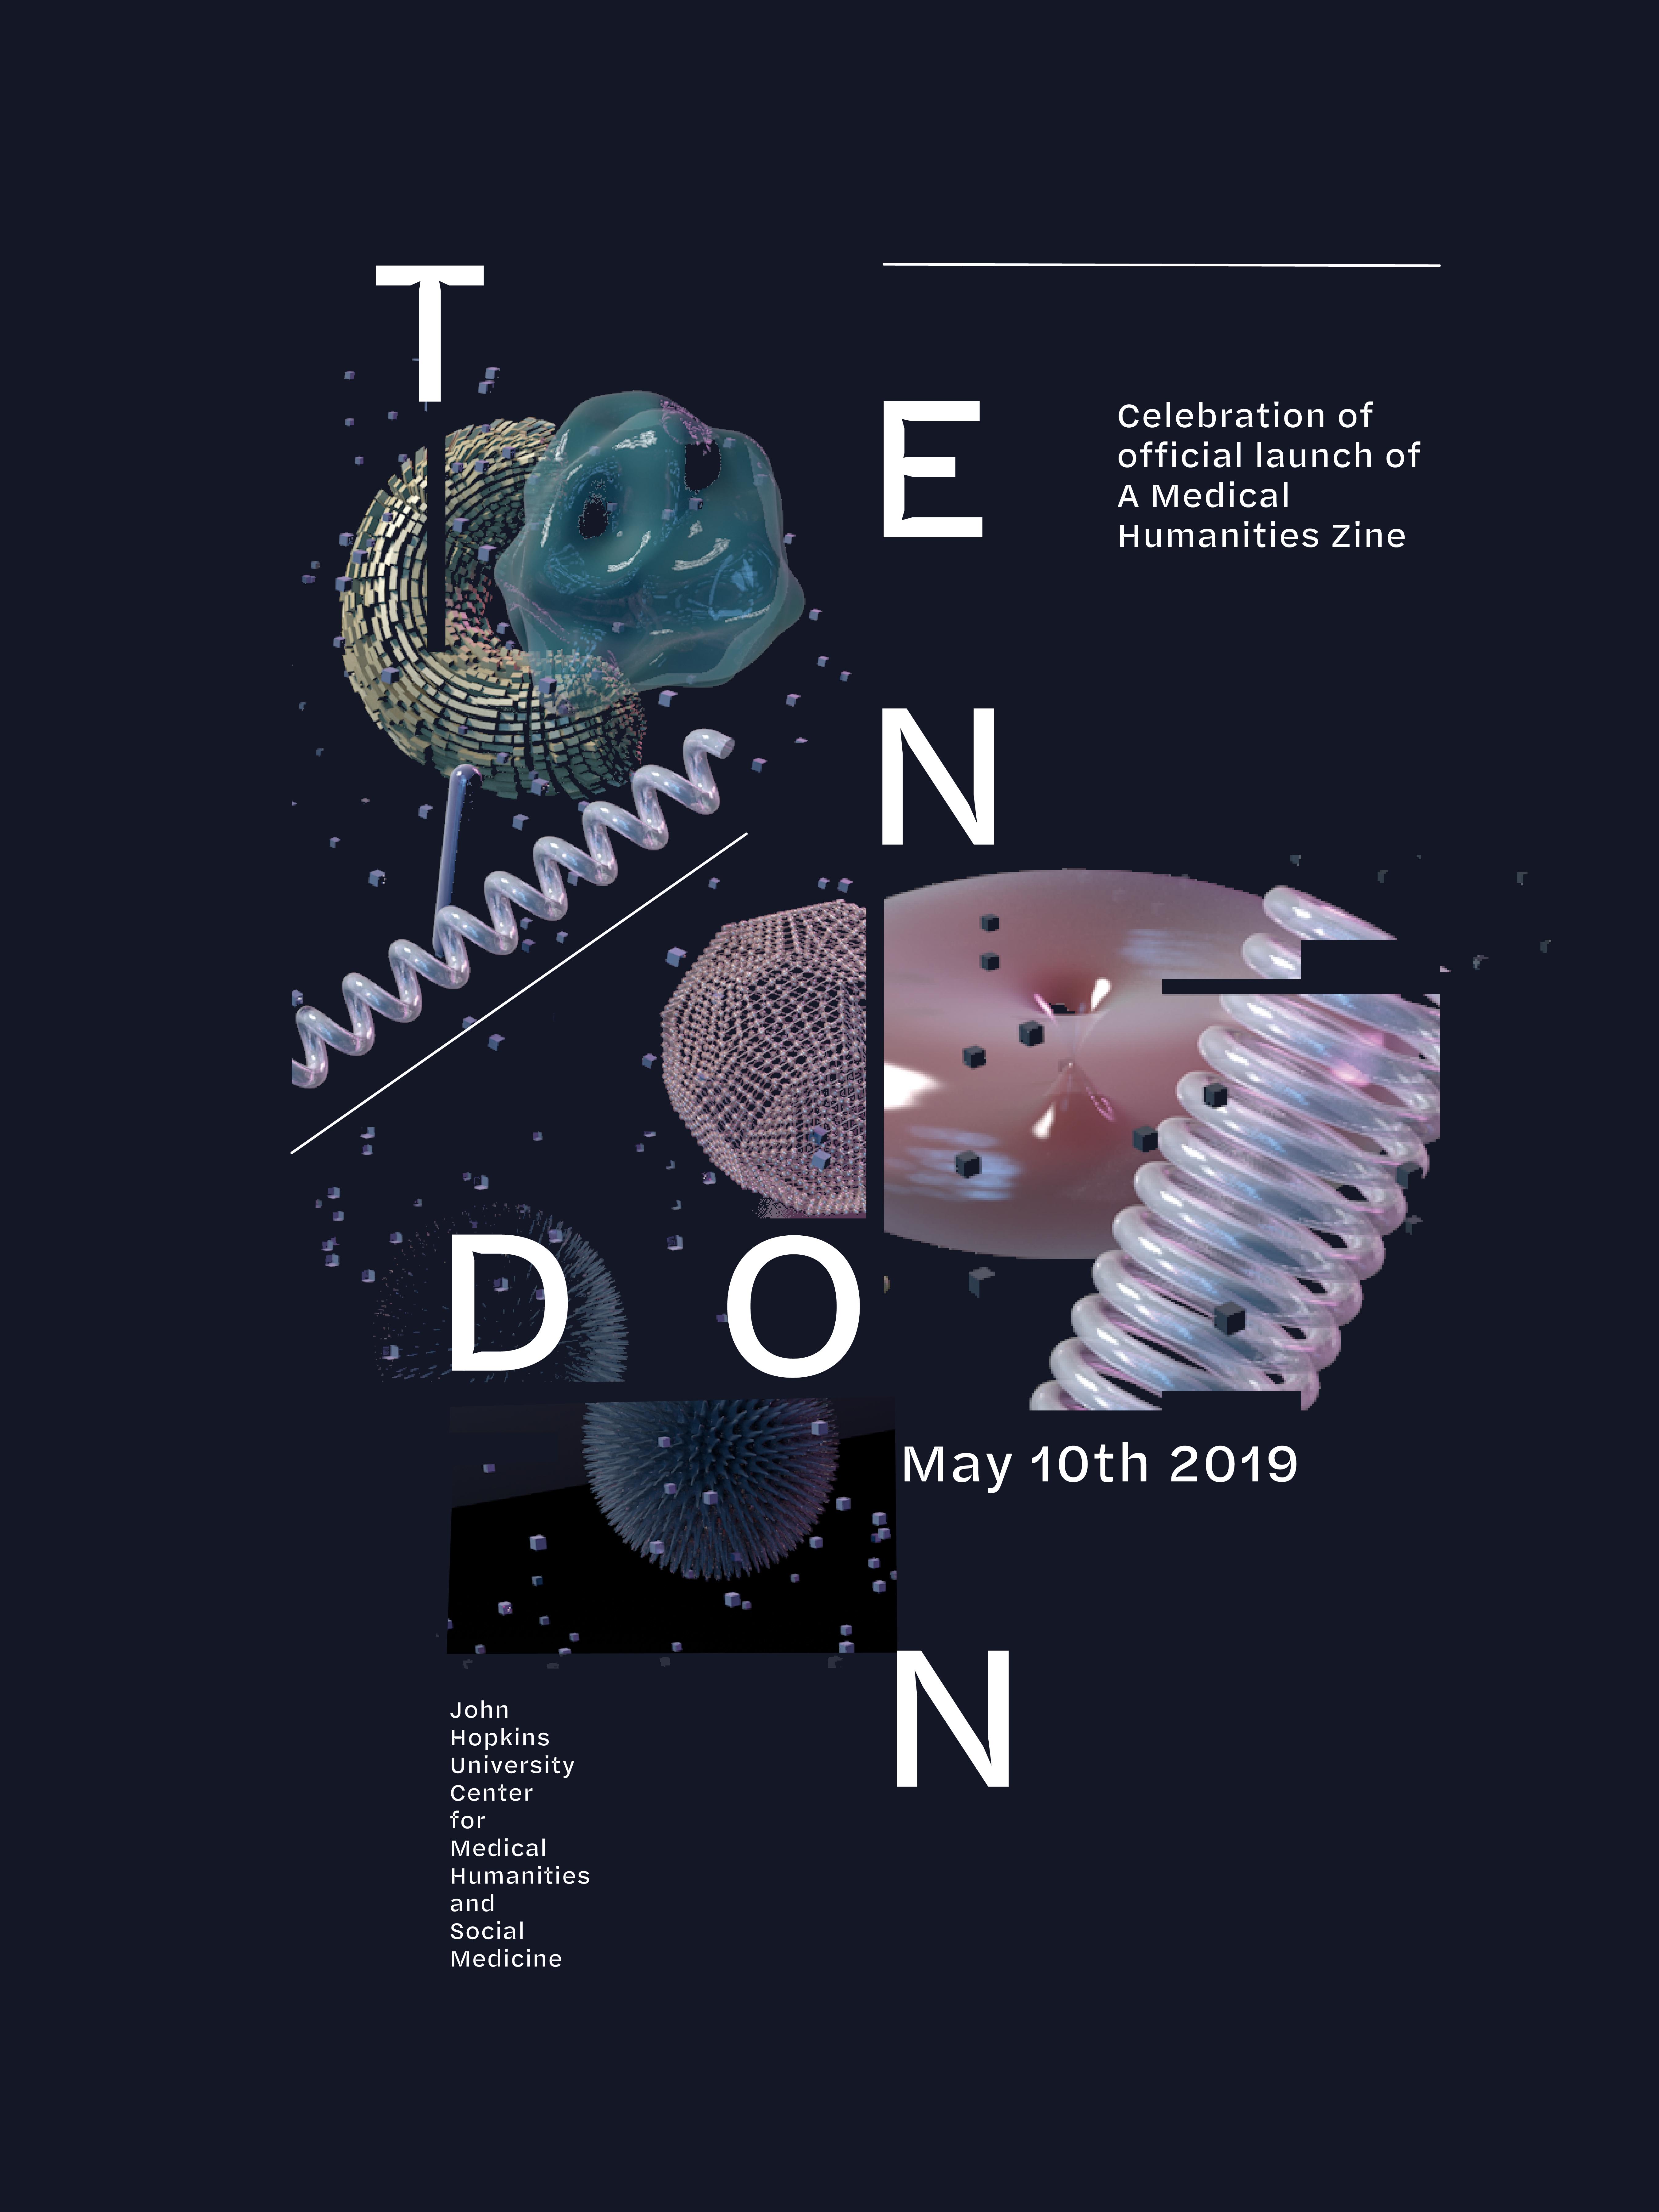 Tendon digital zine May 2019